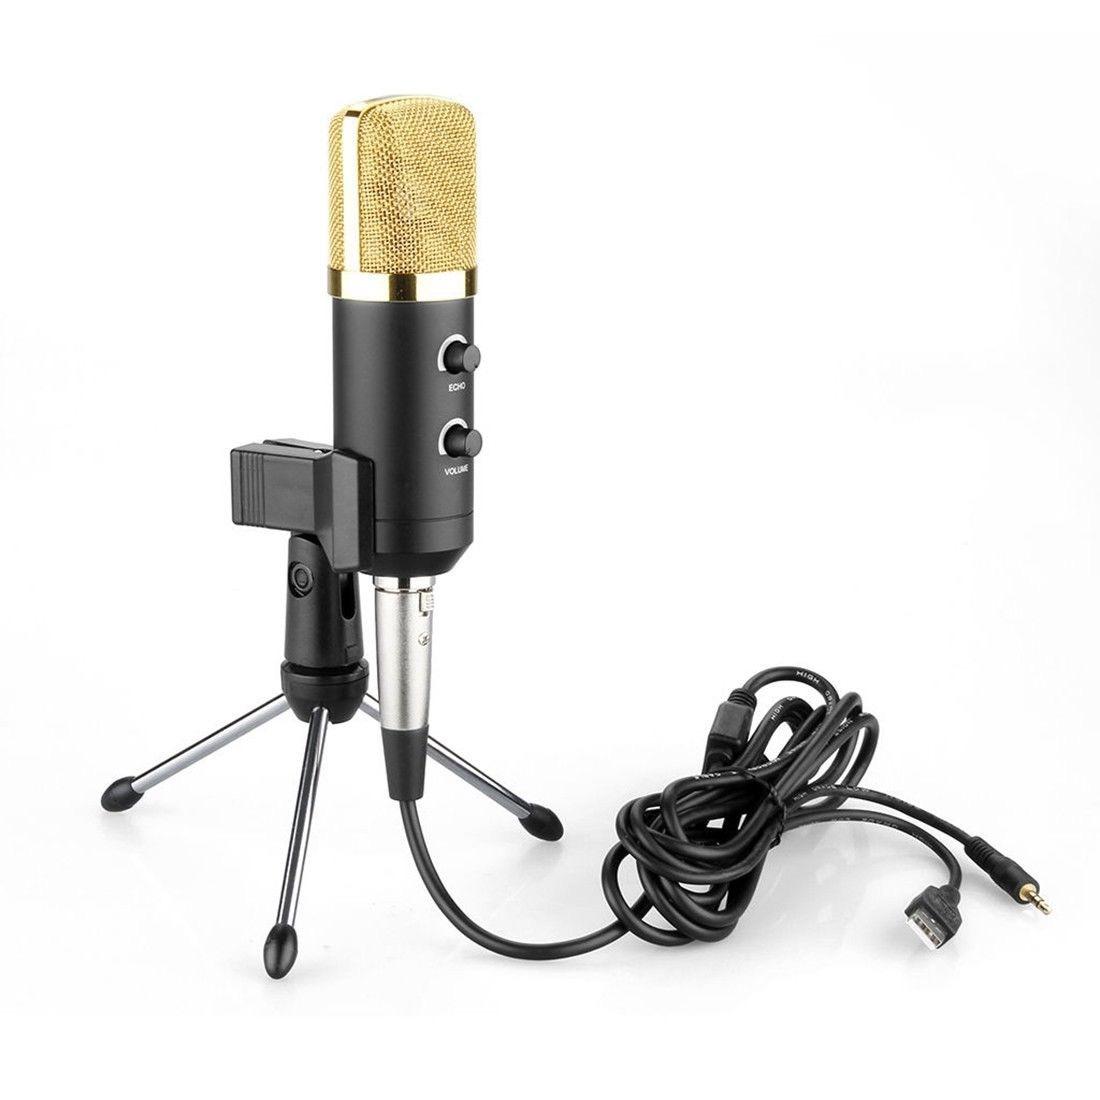 5a2967f7c6bd4 micrófono condensador triple profesional usb podcast metal. Cargando zoom.